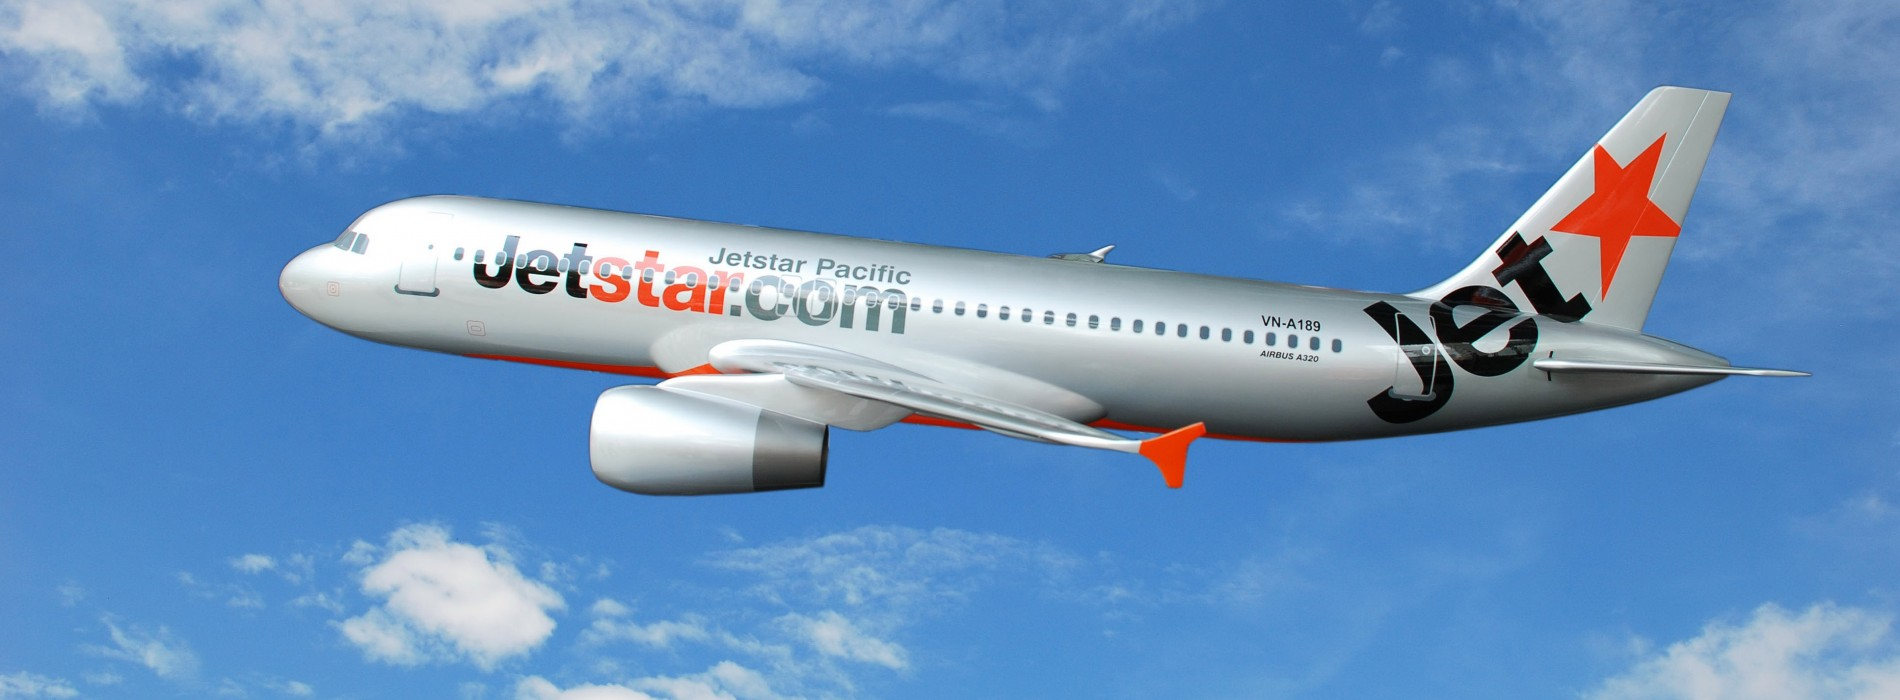 Emirates signs codeshare partnership with Jetstar Pacific